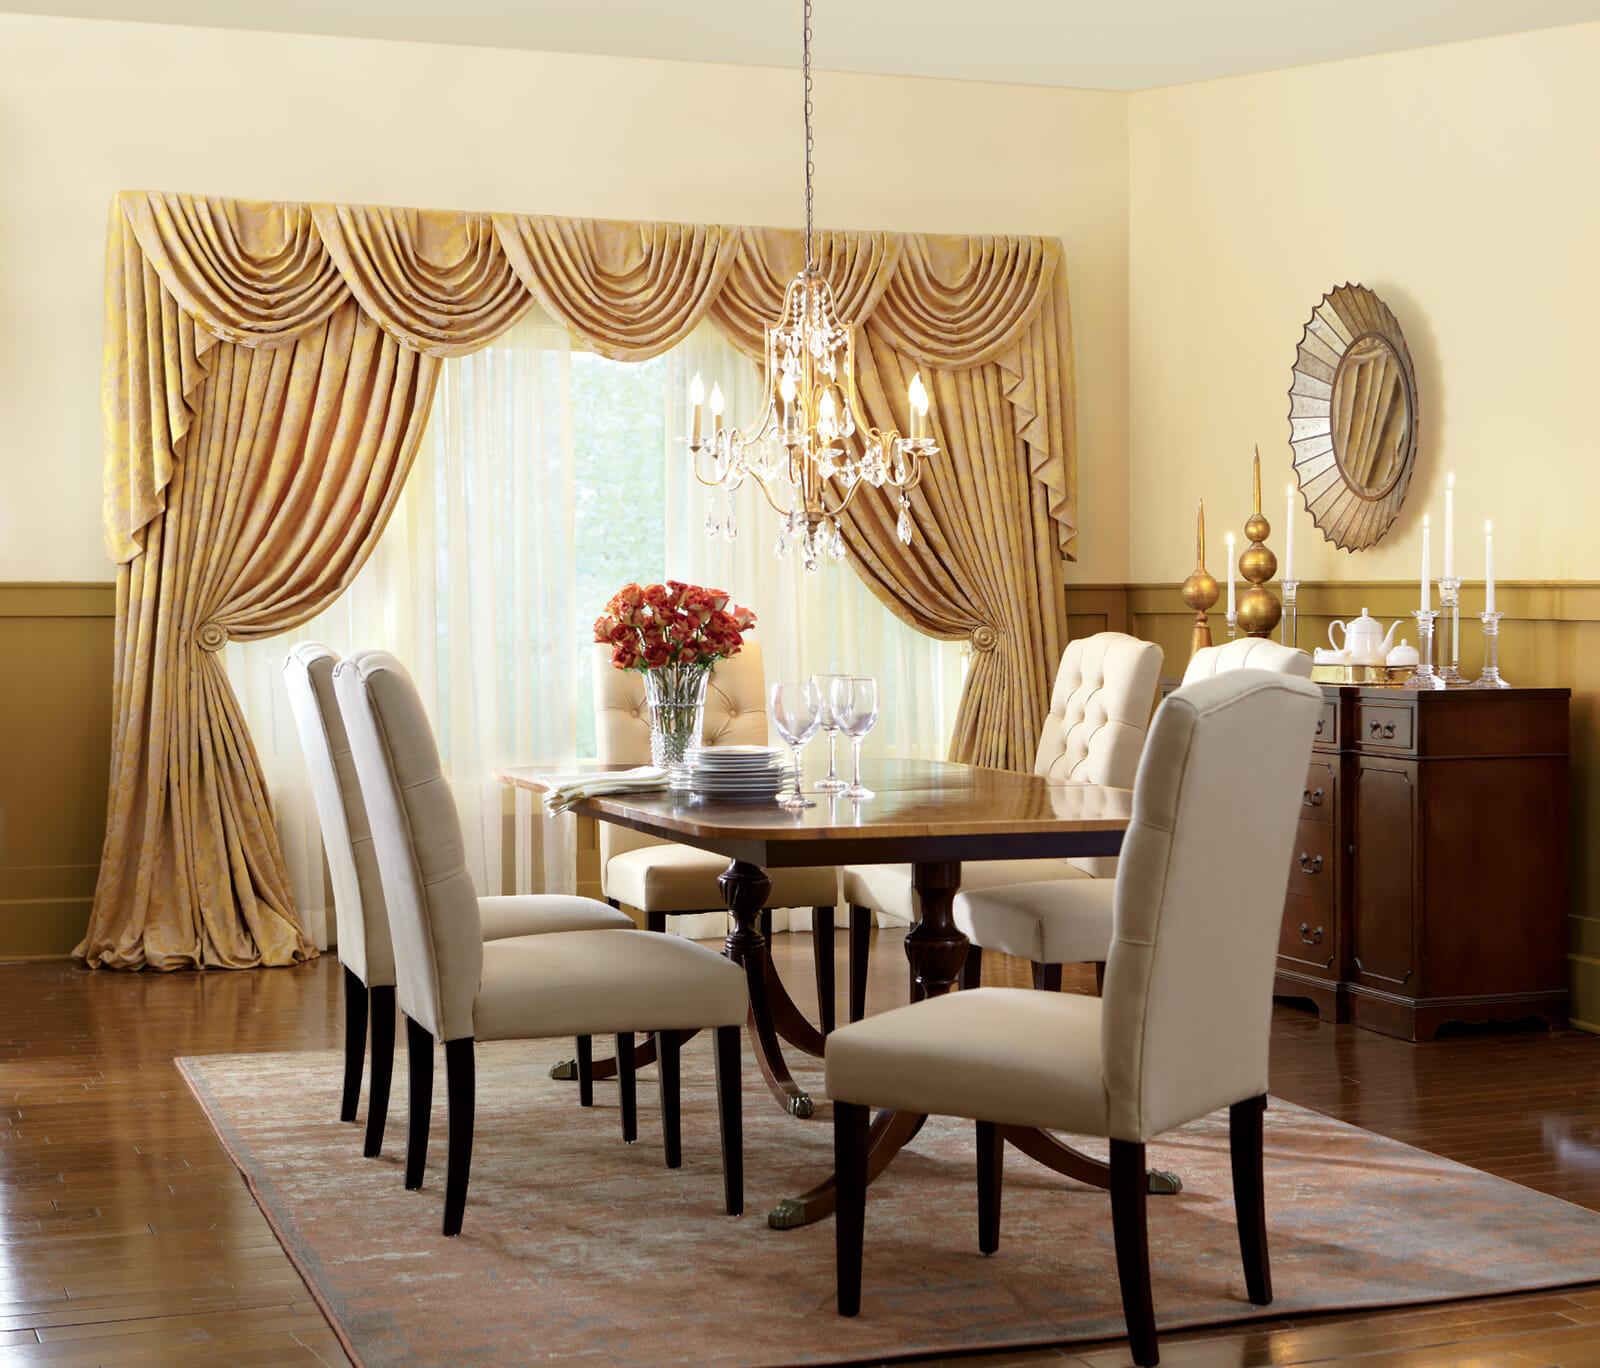 Luxury Apartment Decor Cozy Living Space Winter